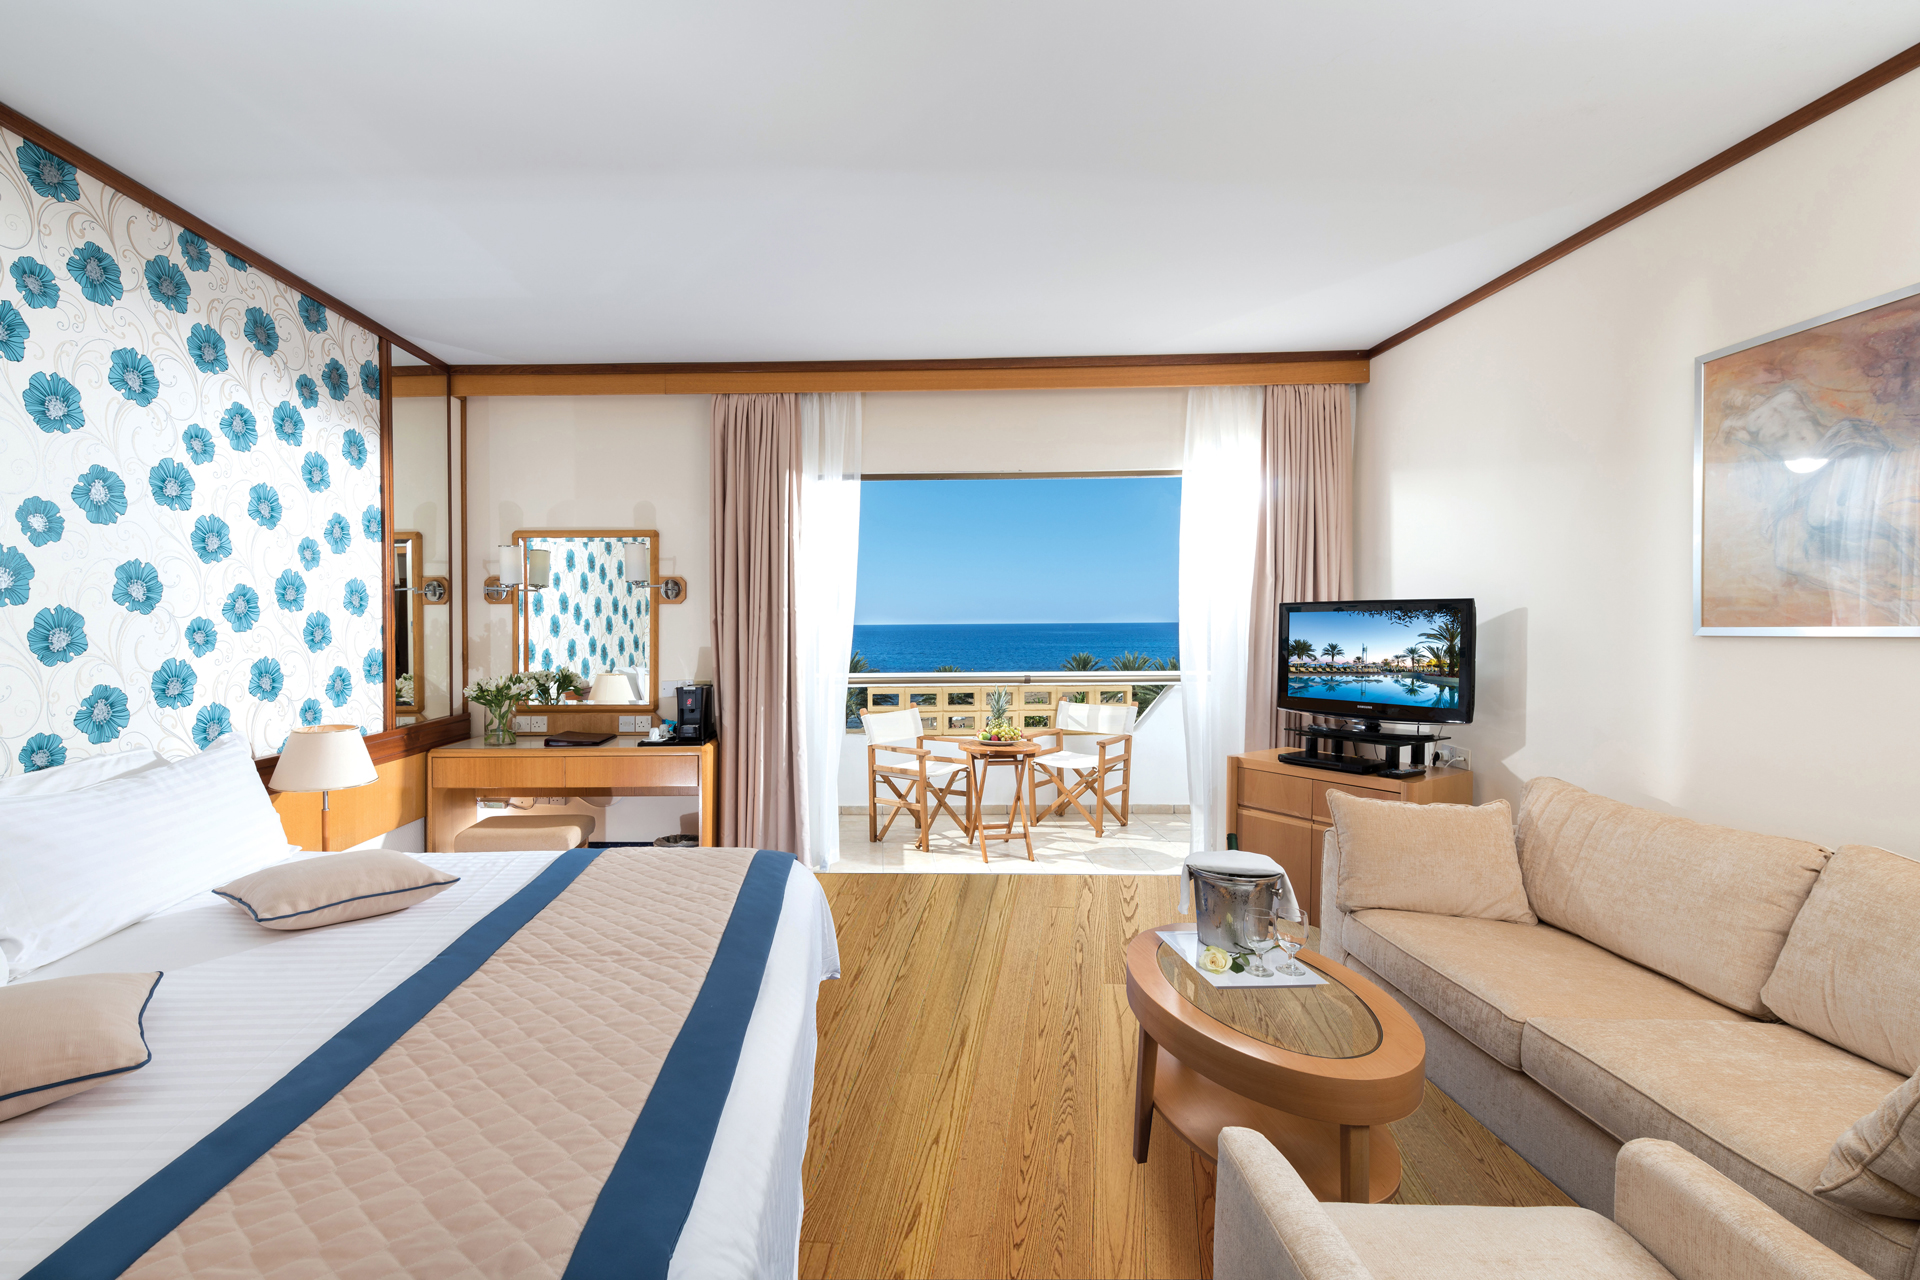 30-ATHENA-ROYAL-BEACH-HOTEL-SUPERIOR-DELUXE-ROOM